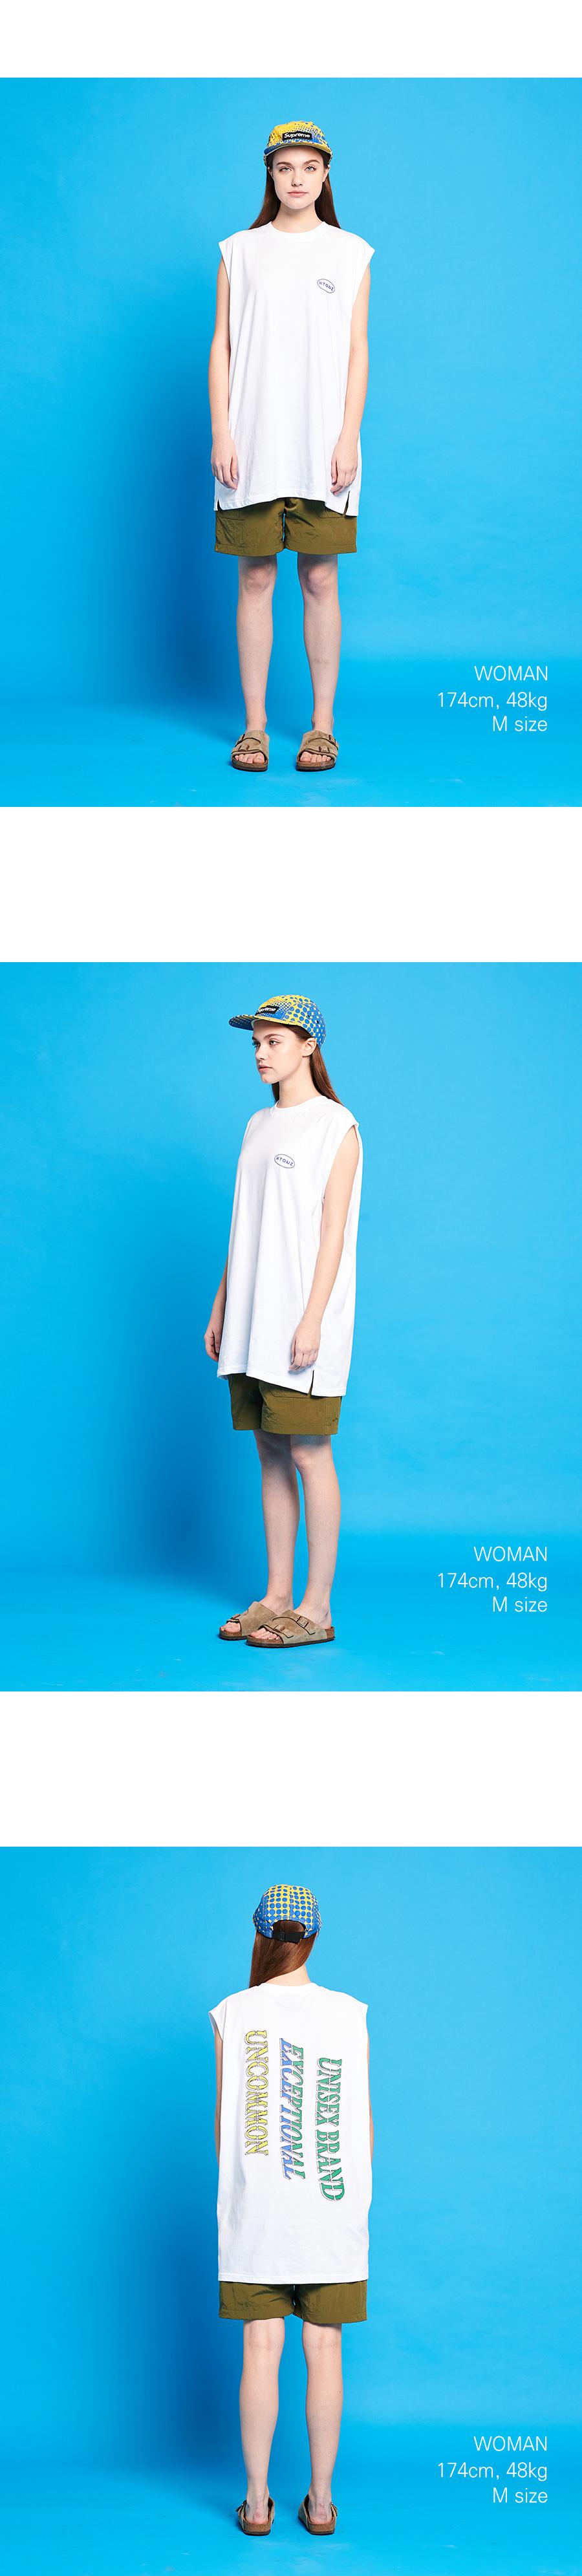 xtt011_wh_woman_1.jpg